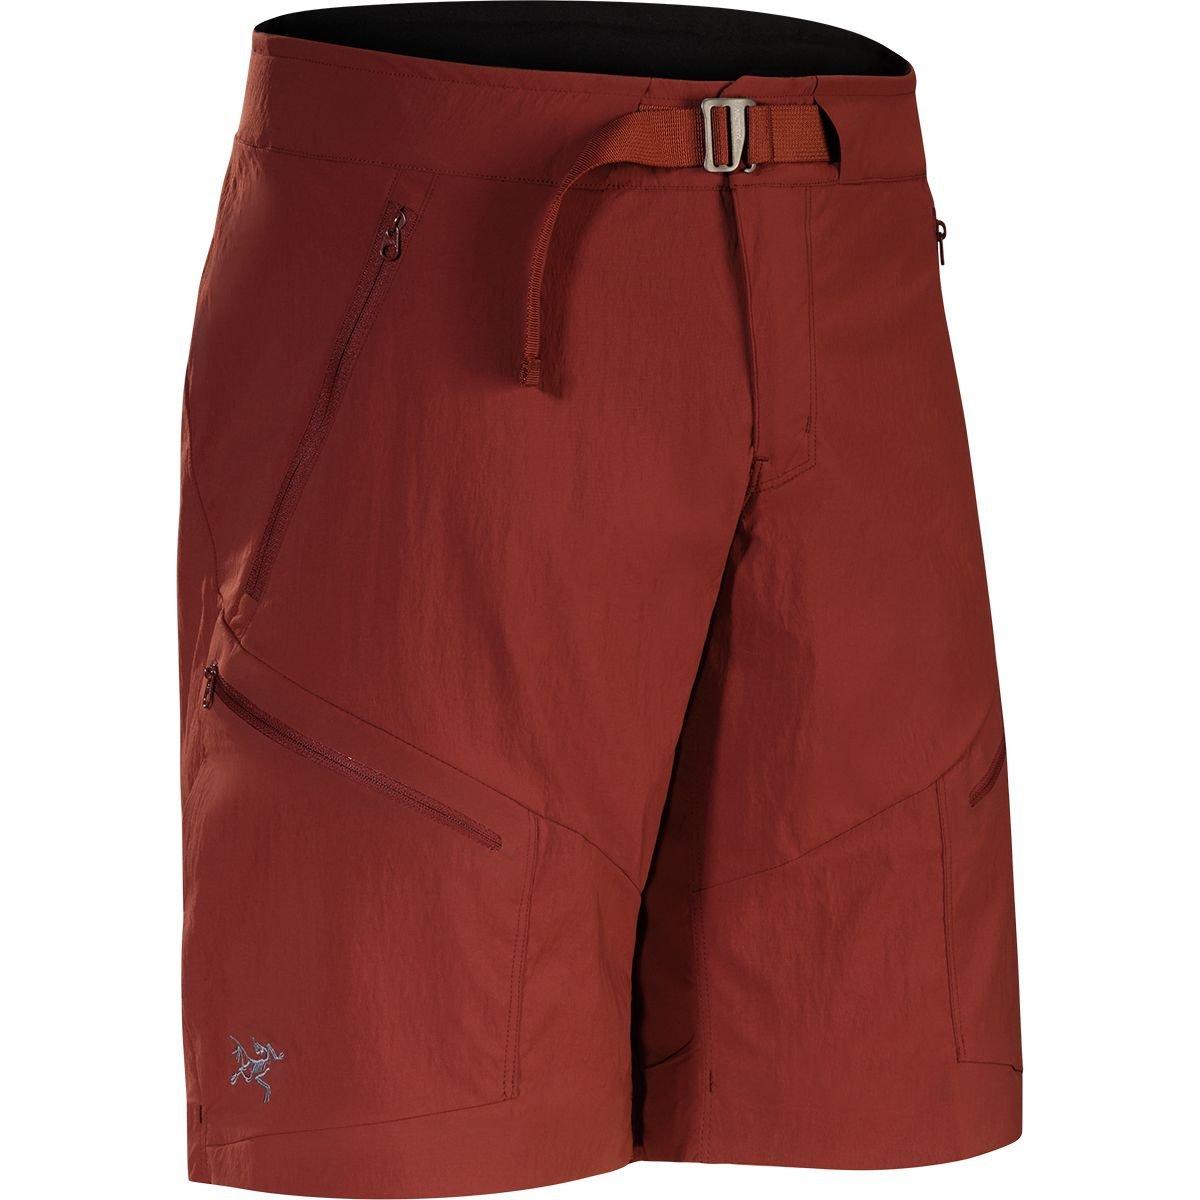 ARC'TERYX(アークテリクス) Palisade Short Men's パリセード ショート メンズ 22400 B078YFNGCB 38|Pompeii Pompeii 38